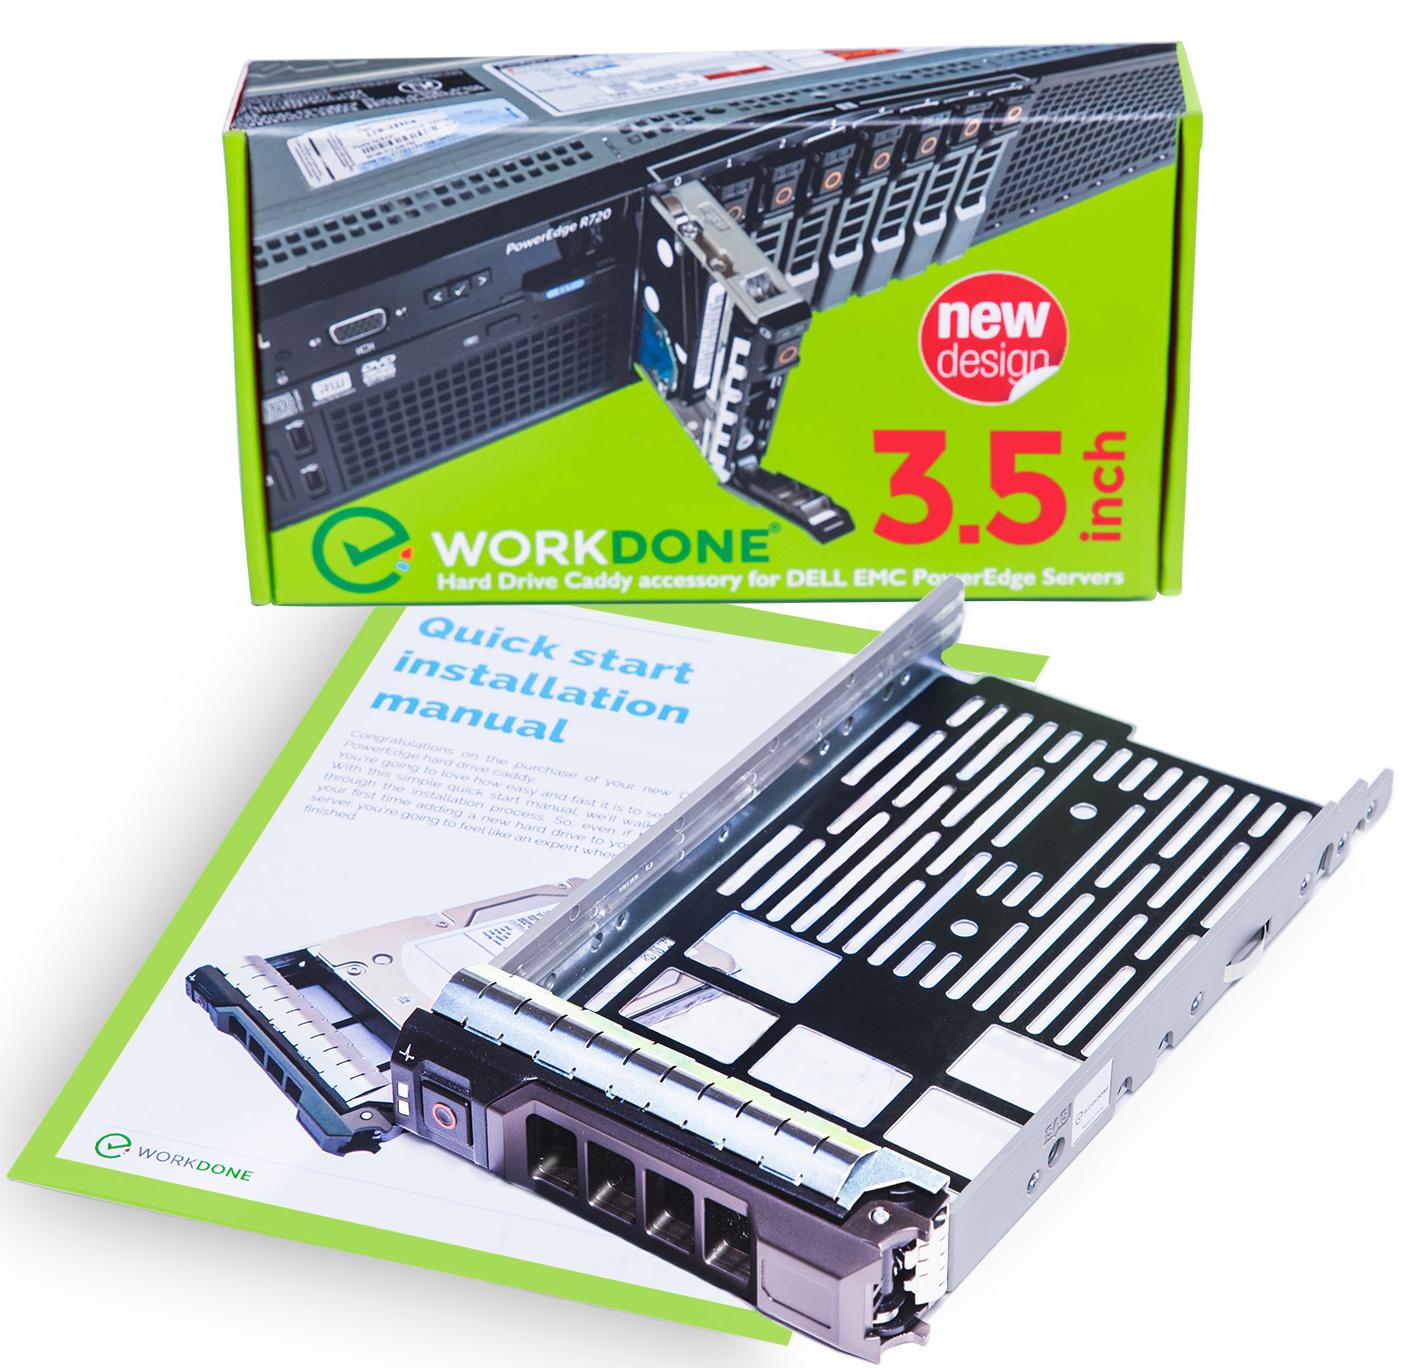 Dell Poweredge R720 Manual